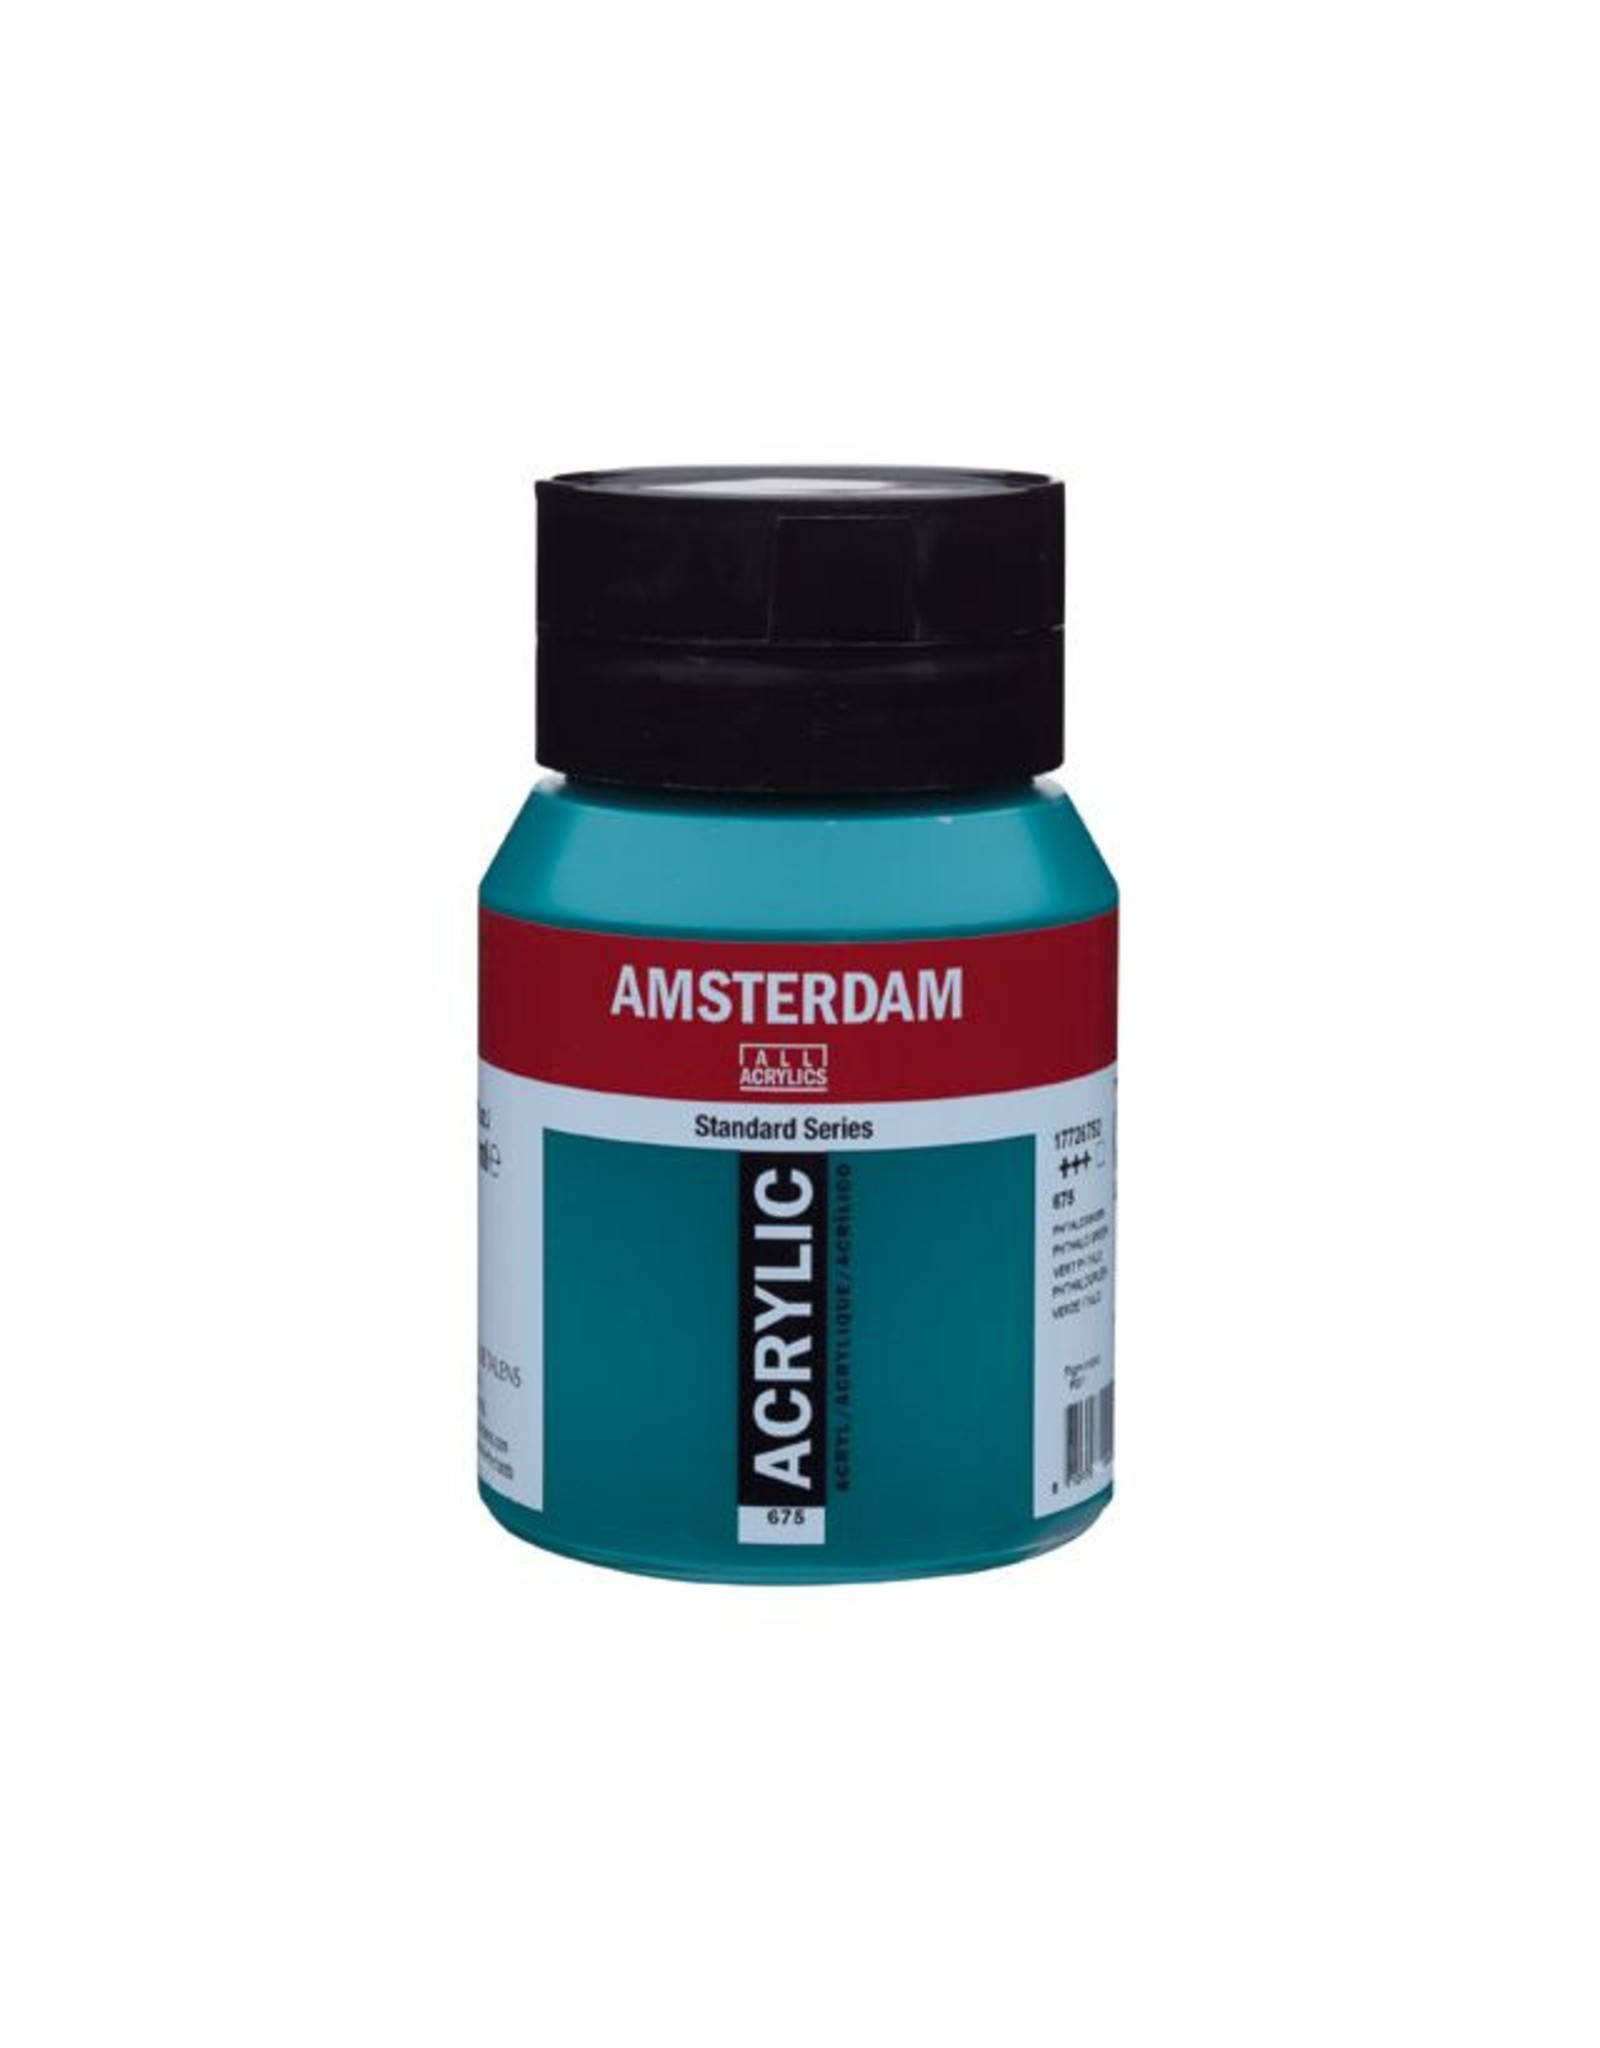 Talens Amsterdam acrylverf Phtalogroen 500ML